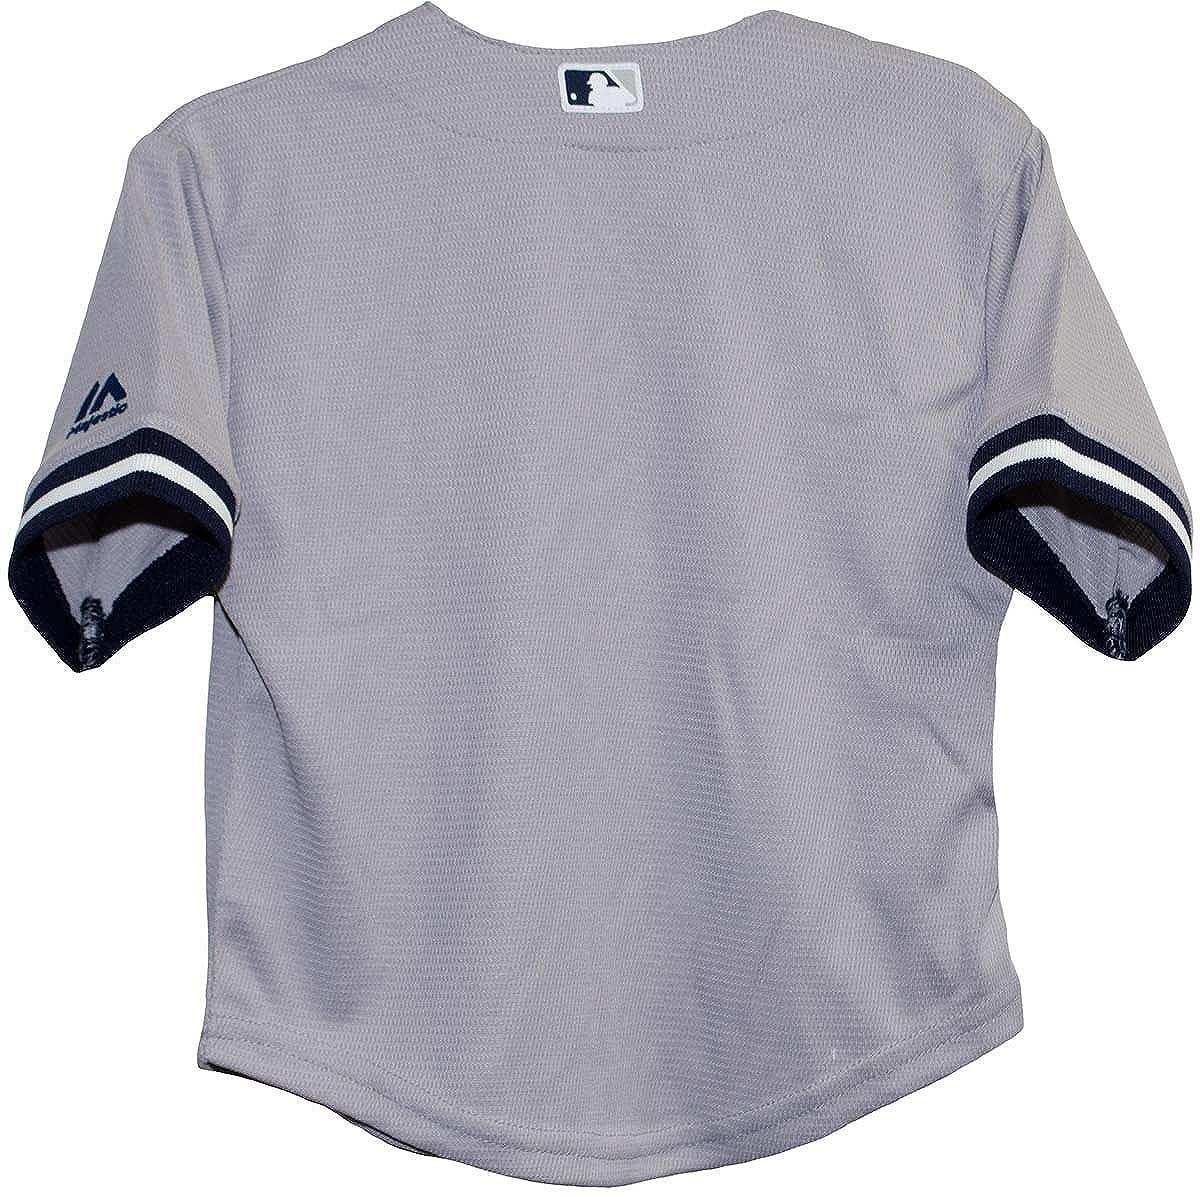 b6875020bf8 Amazon.com  Majestic Big Kid s New York Yankees Gray Major League Baseball  MLB Jersey (7 Large)  Clothing